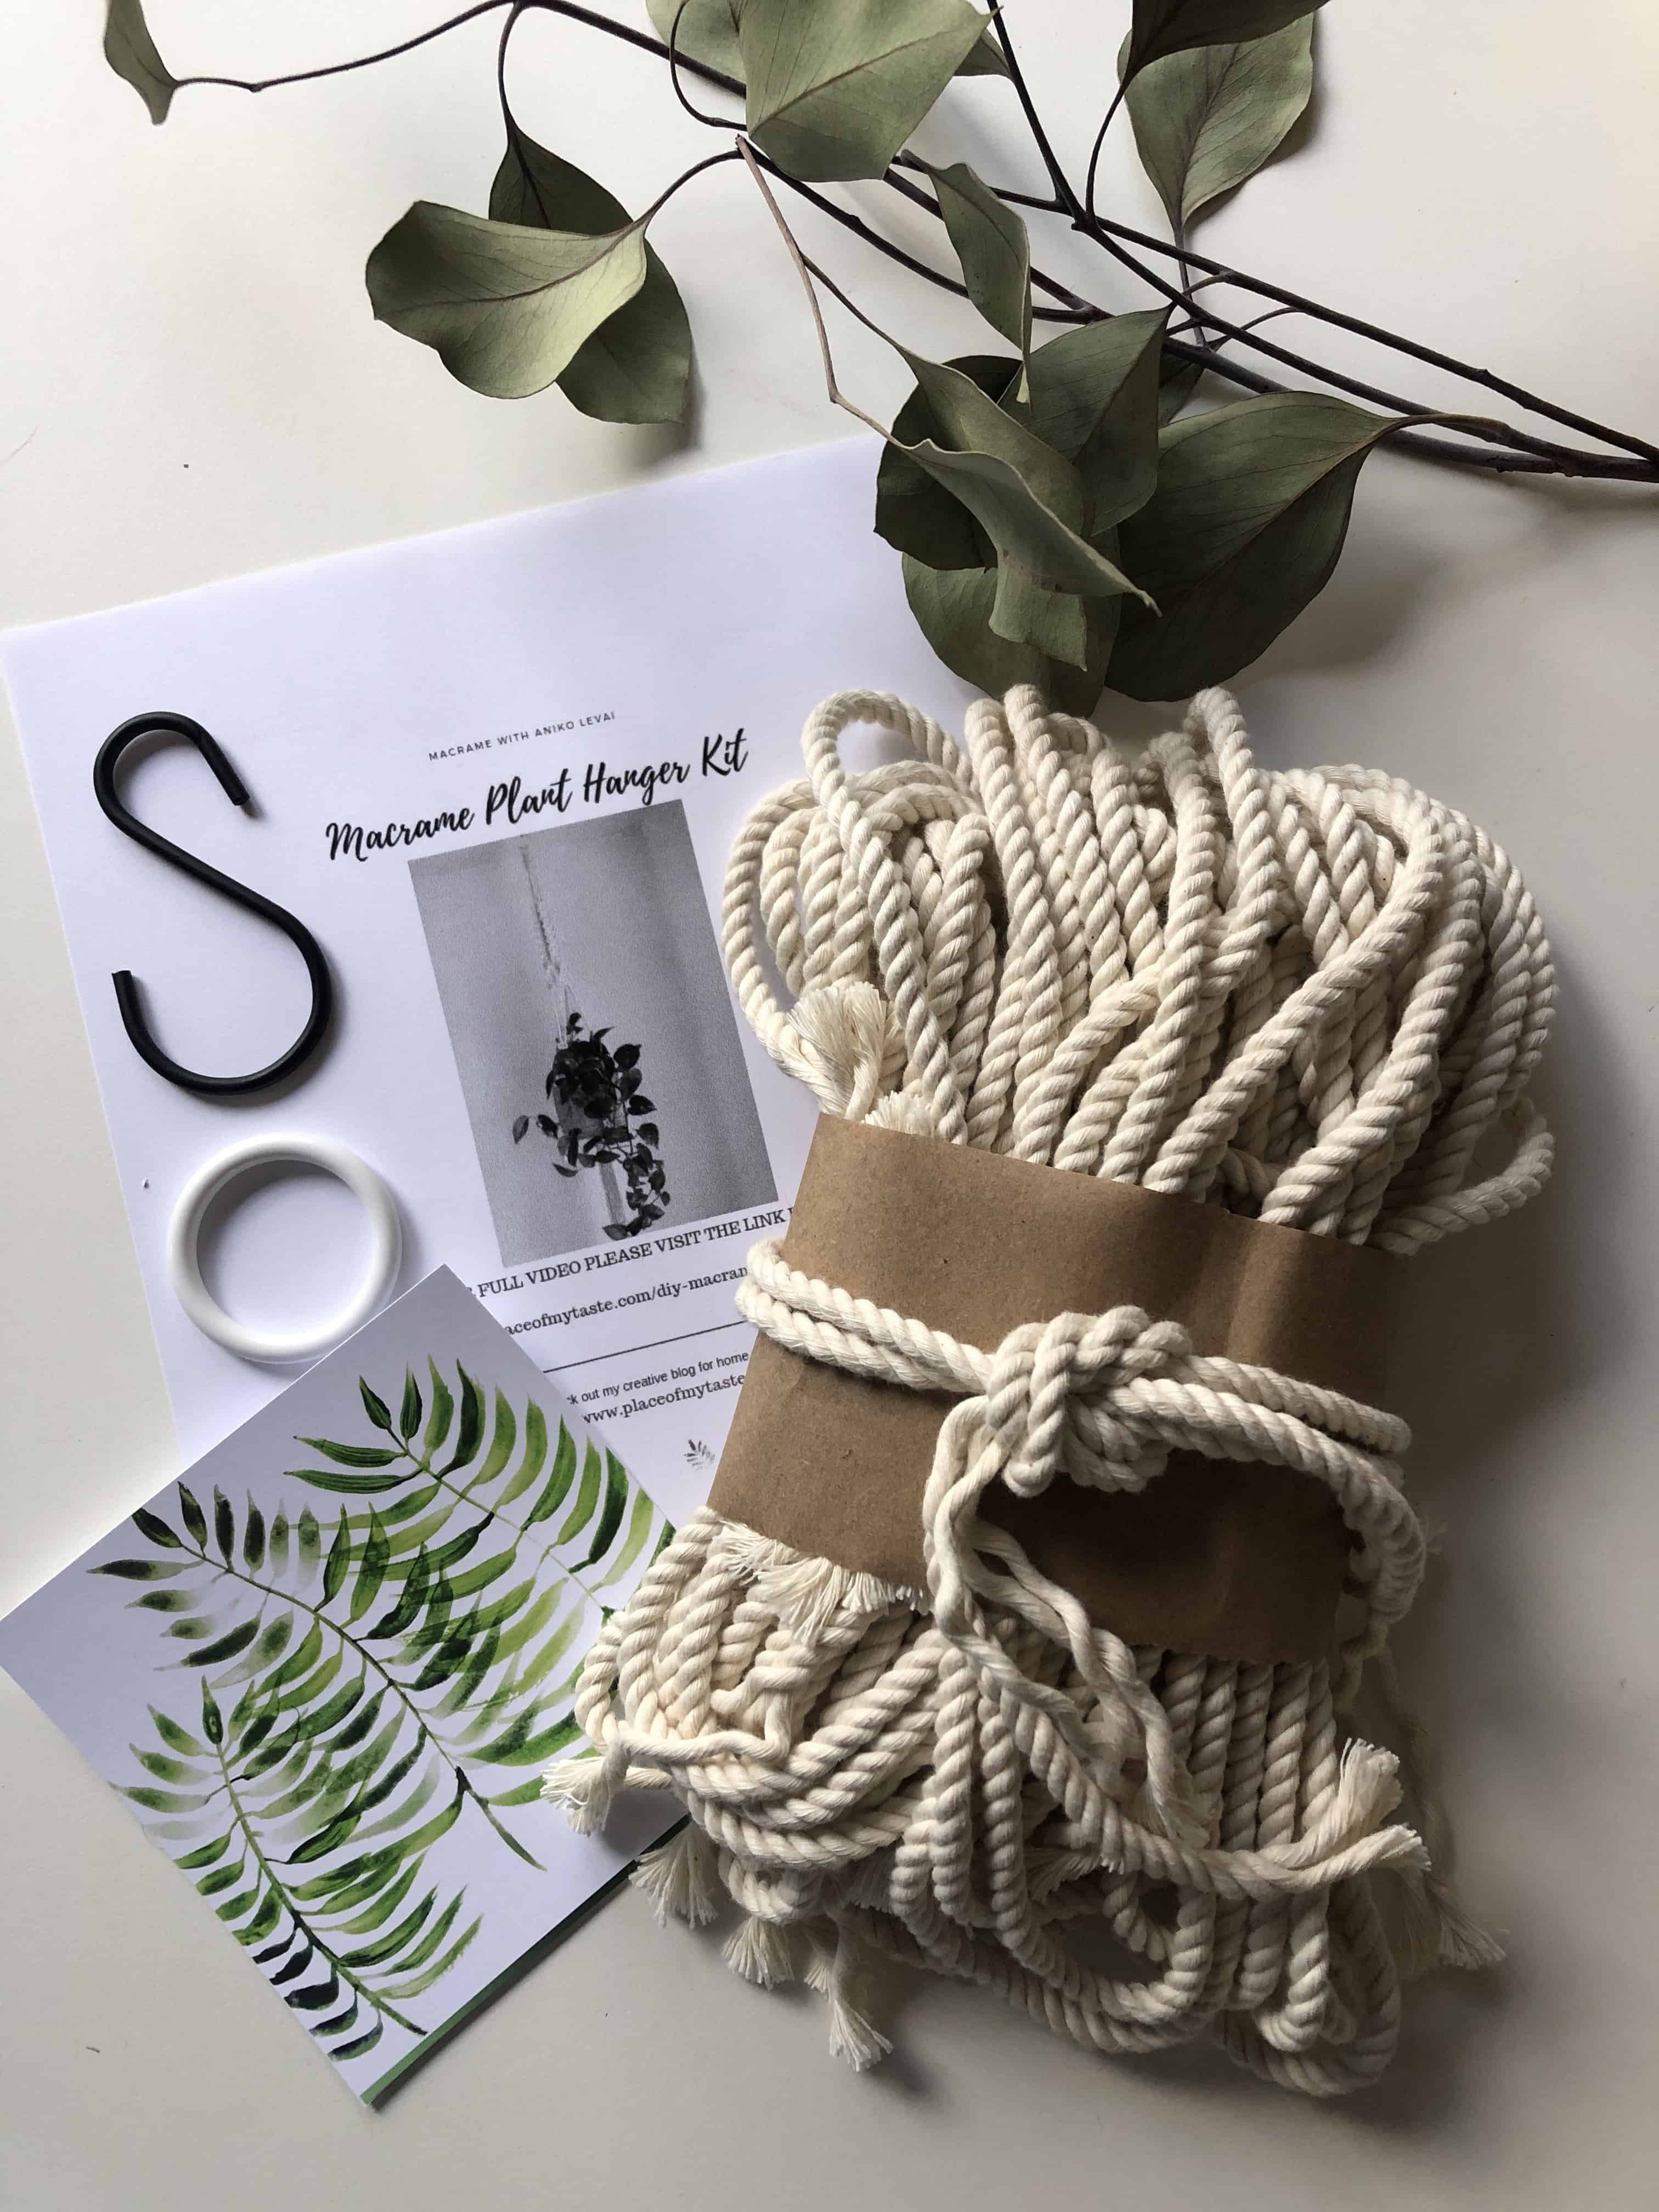 Cool DIY Macrame Plant Hanger